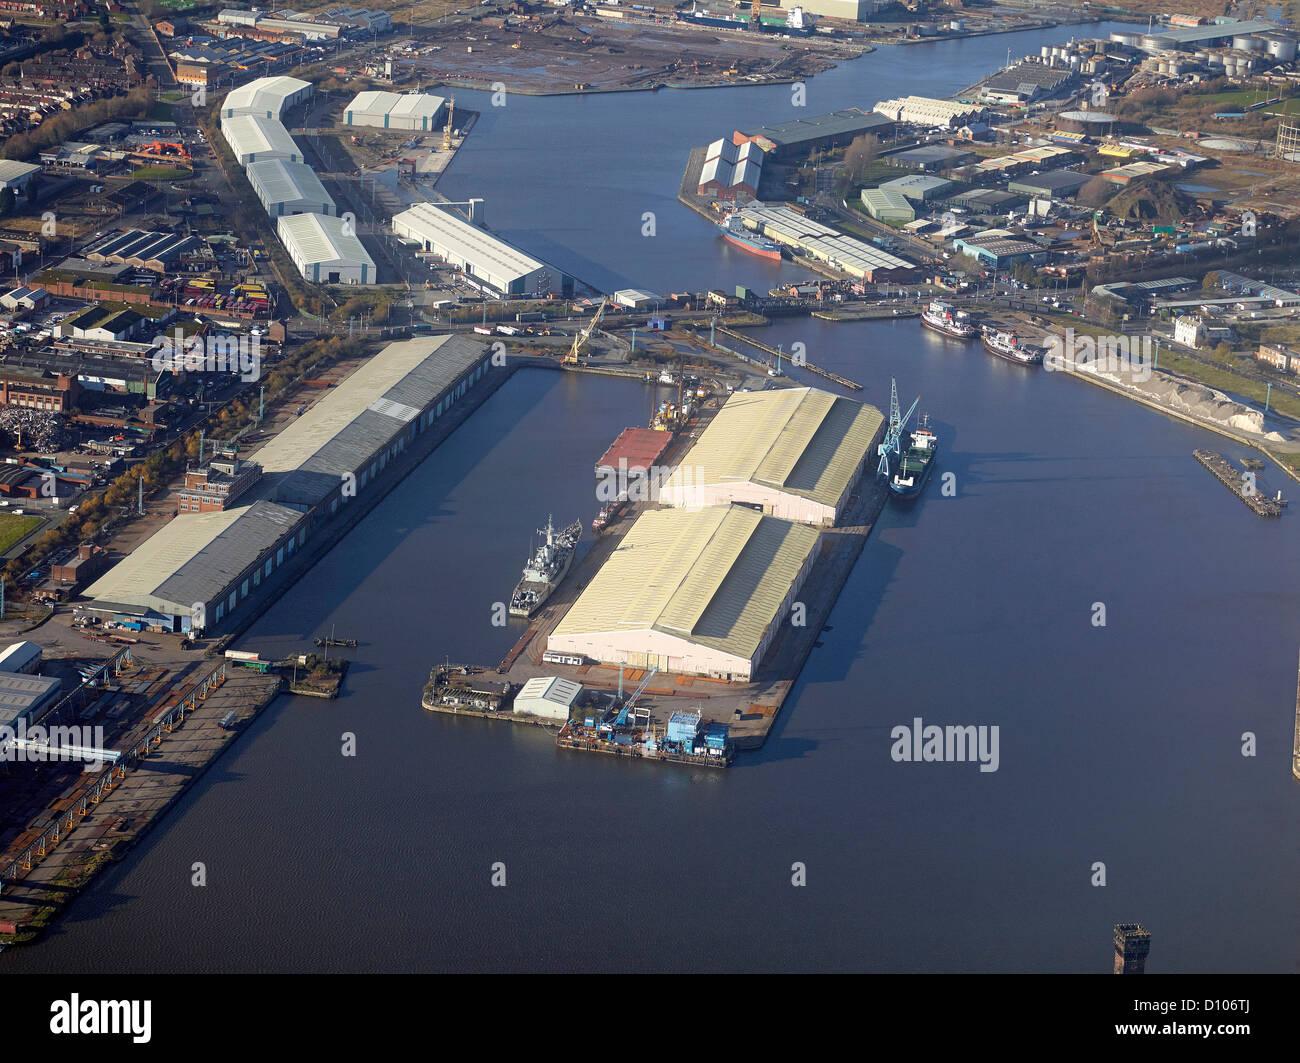 Aerial view of Birkenhead Docks, Merseyside, North West England - Stock Image